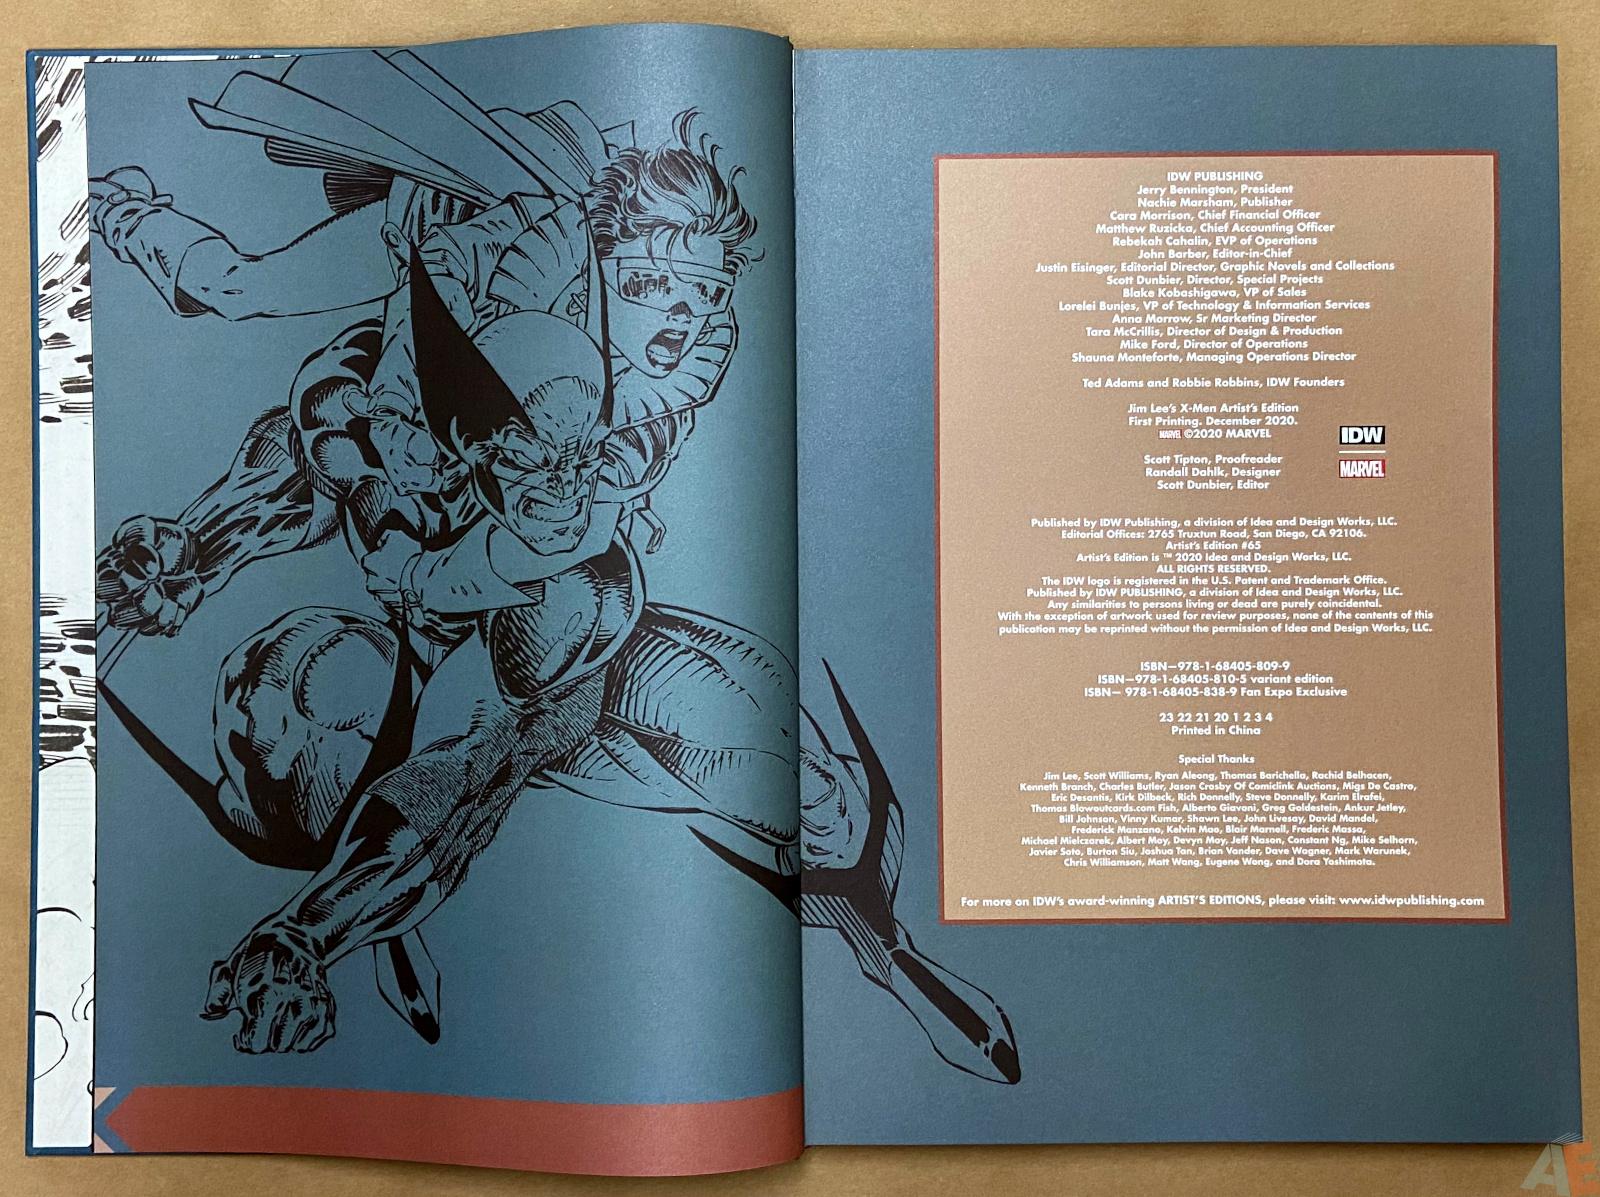 Jim Lees X Men Artists Edition interior 1